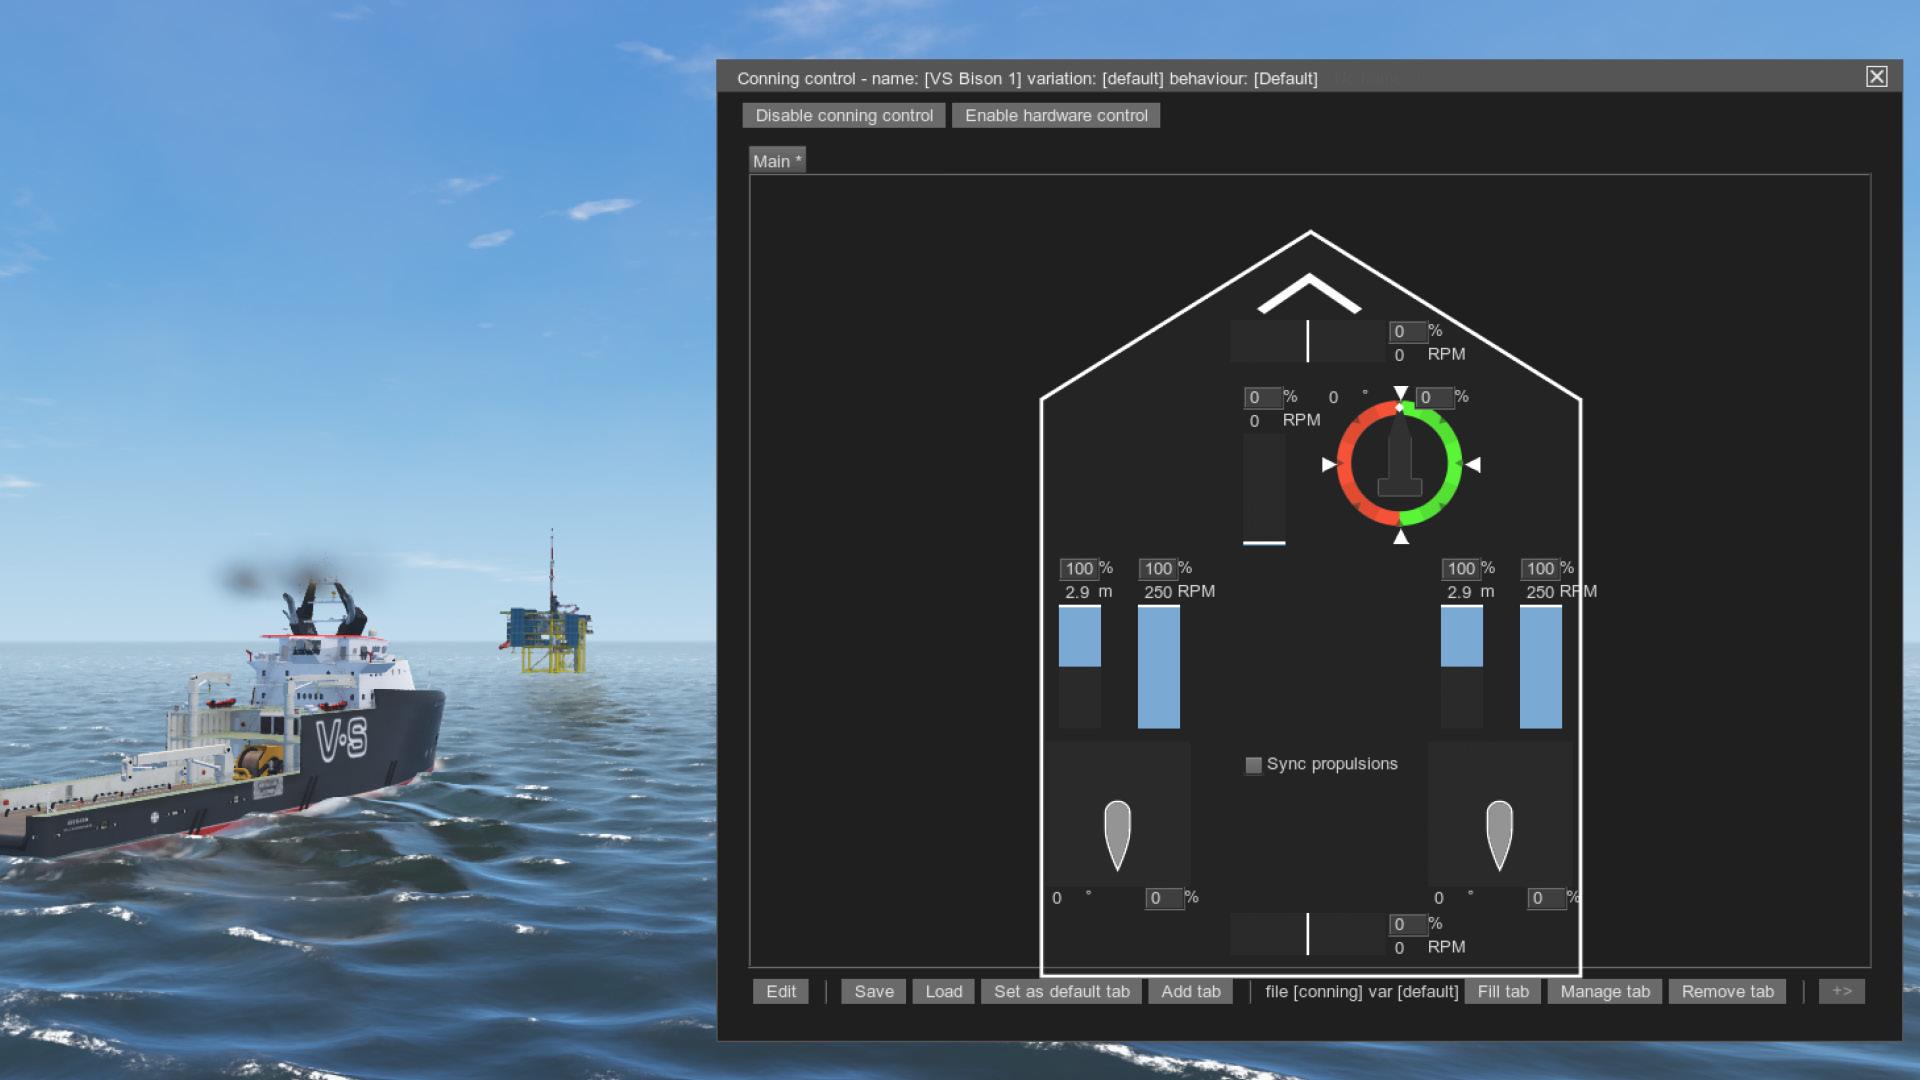 NAUTIS Maritime Simulator Conning Display